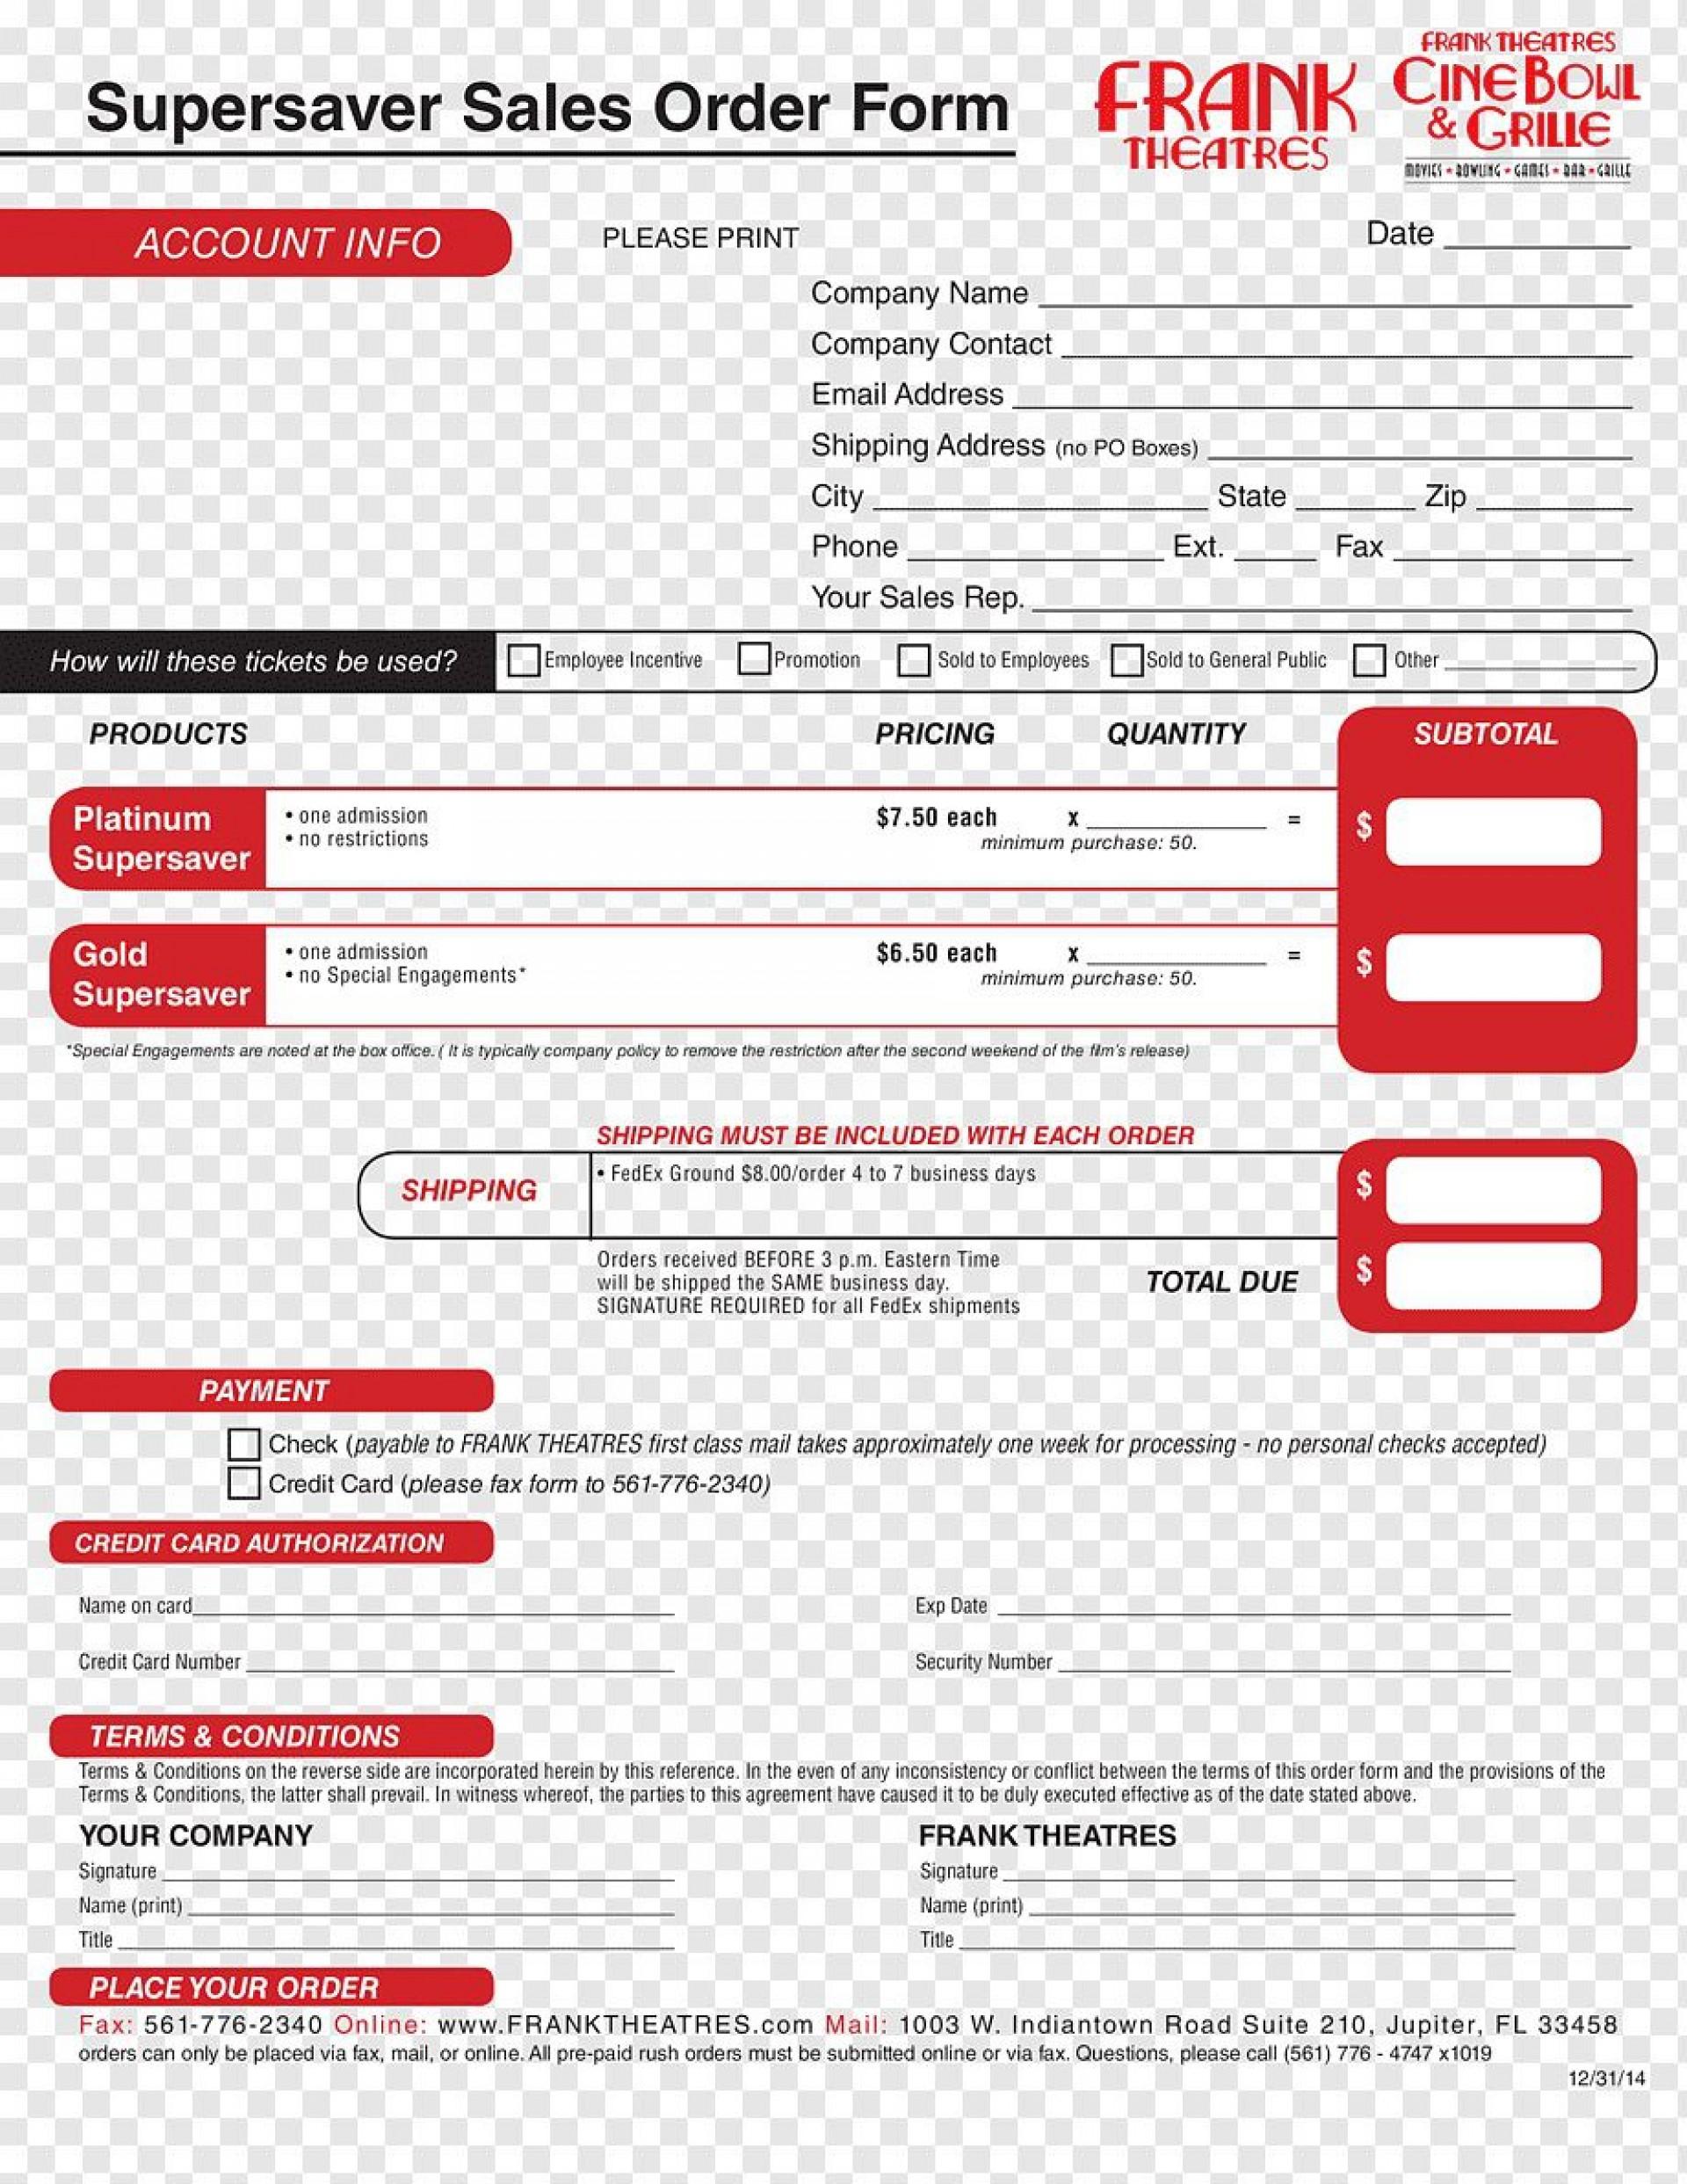 006 Shocking Sale Order Form Template Inspiration  Templates Excel Word Free Online1920